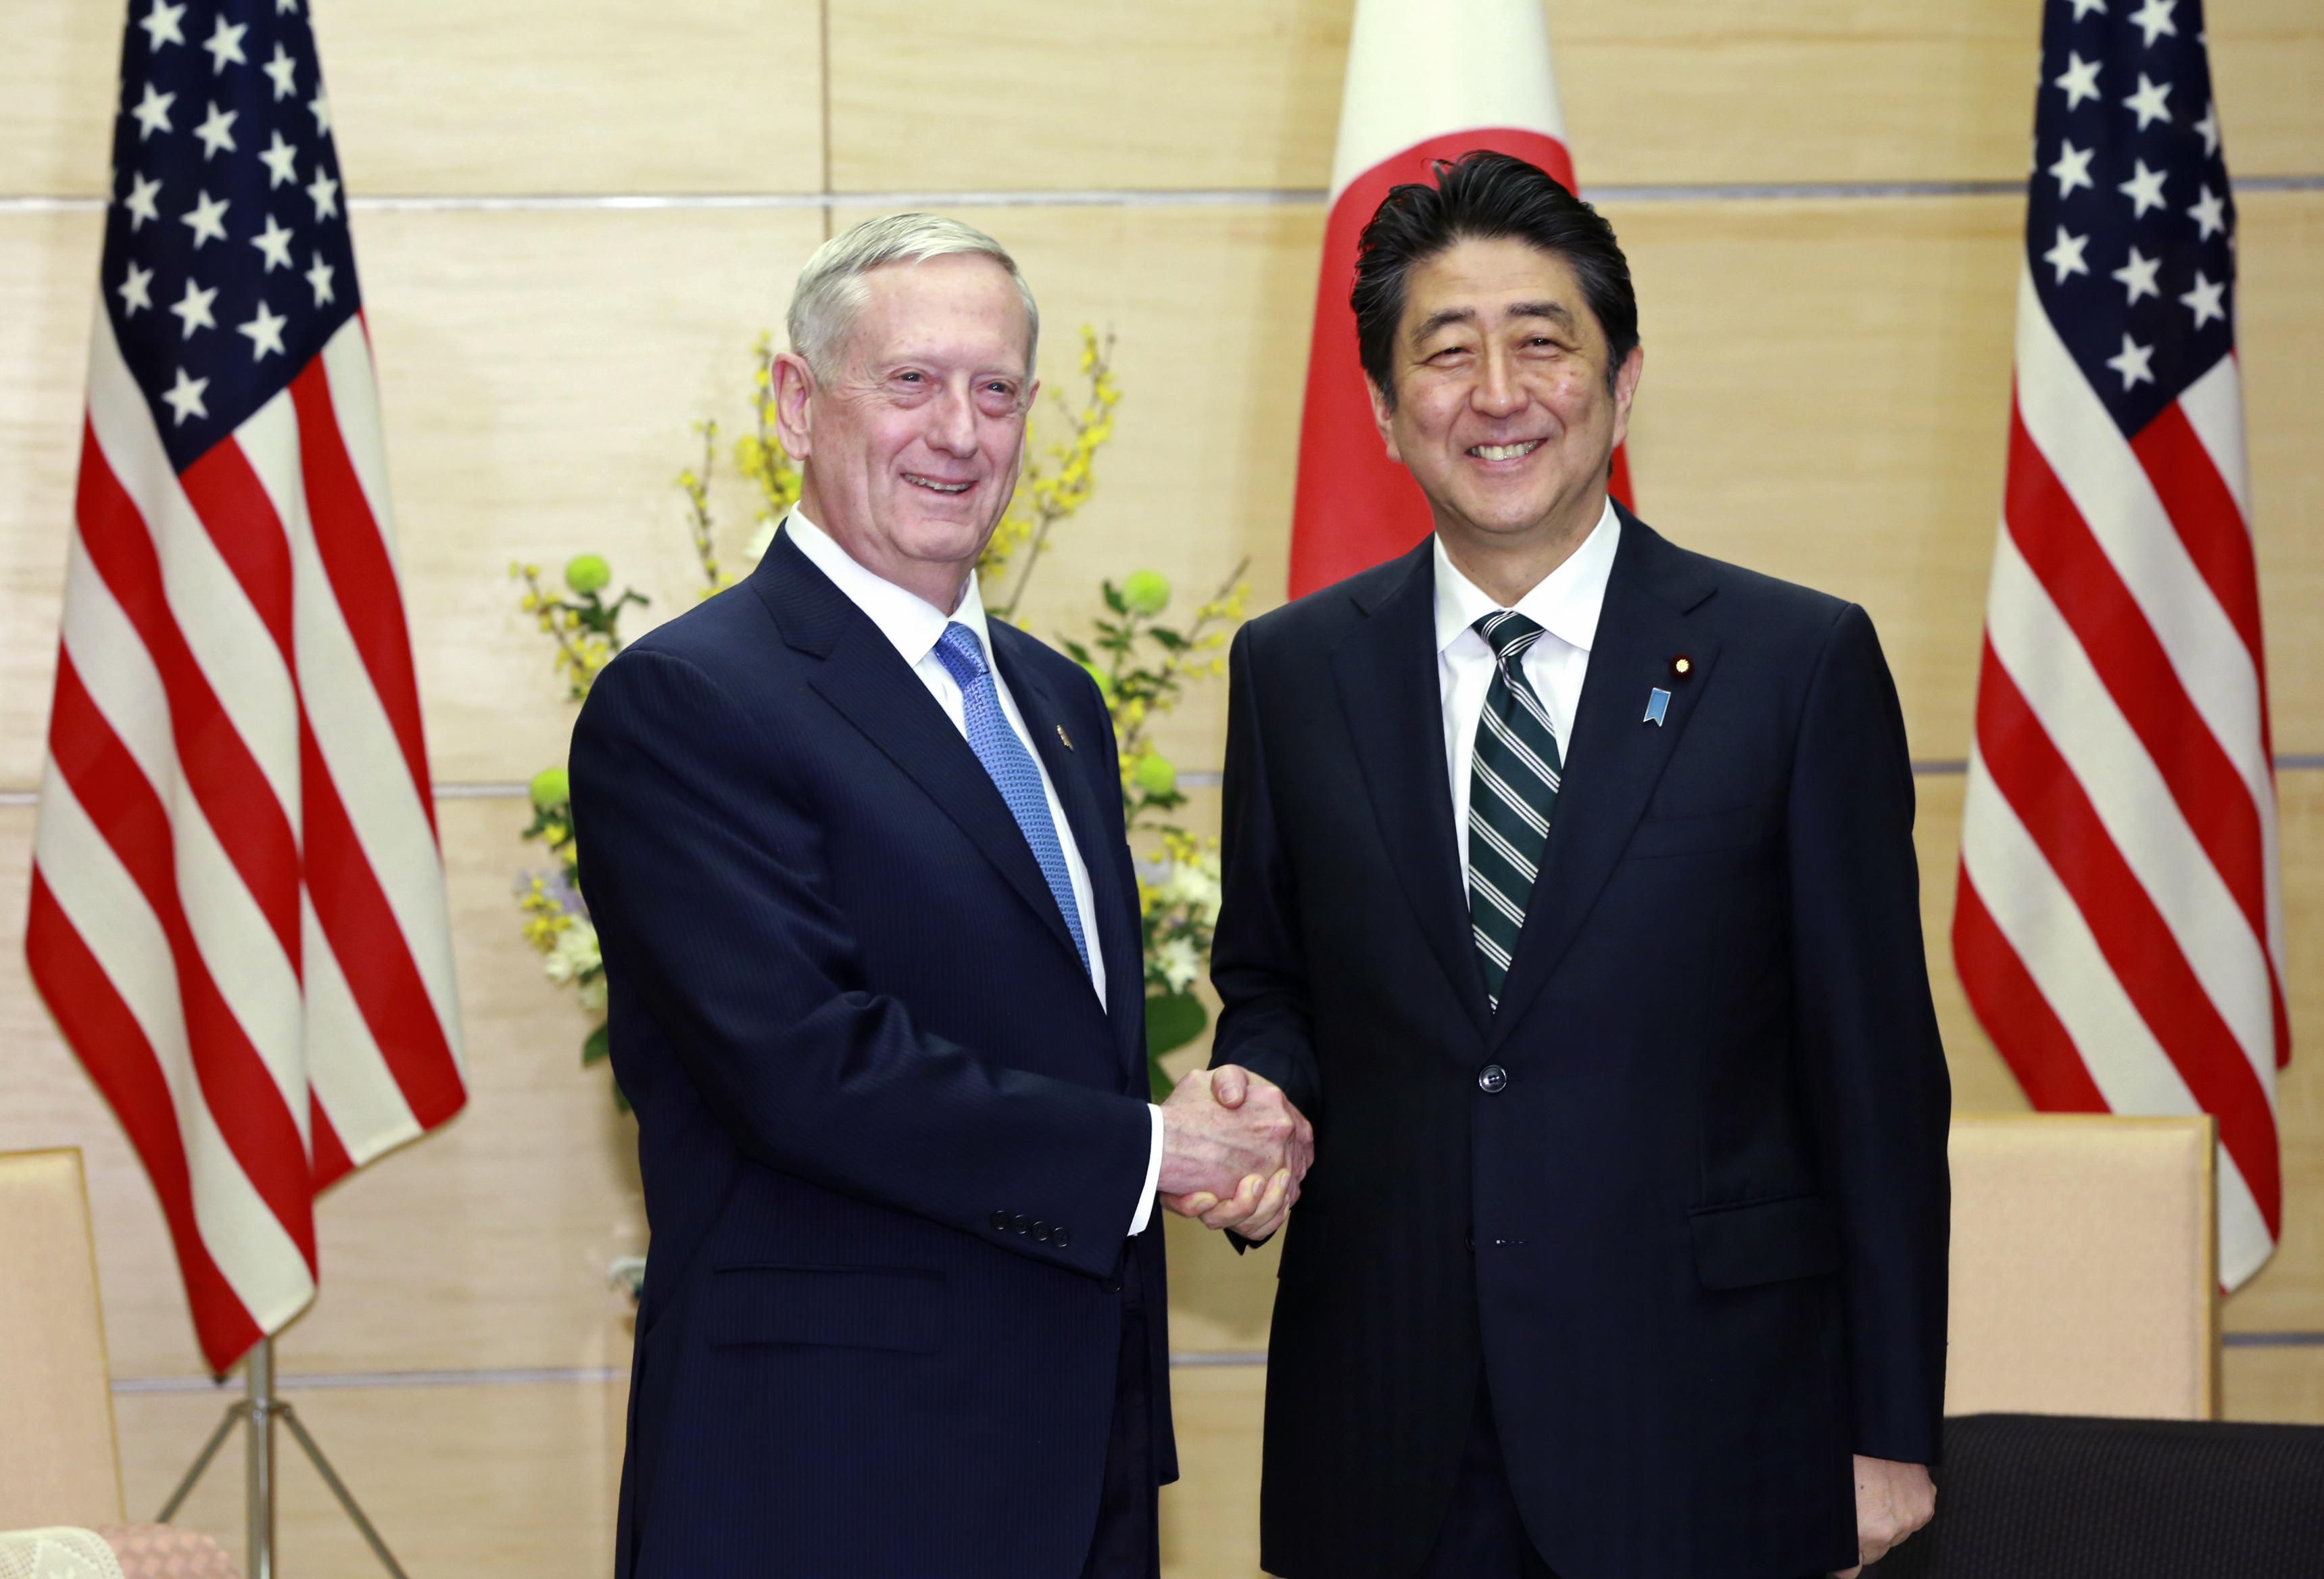 U.S. Defense Secretary Jim Mattis (L) and Japanese Prime Minister Shinzo Abe at the prime minister's office in Tokyo on Feb. 3, 2017. (AP Photo/Eugene Hoshiko, Pool)